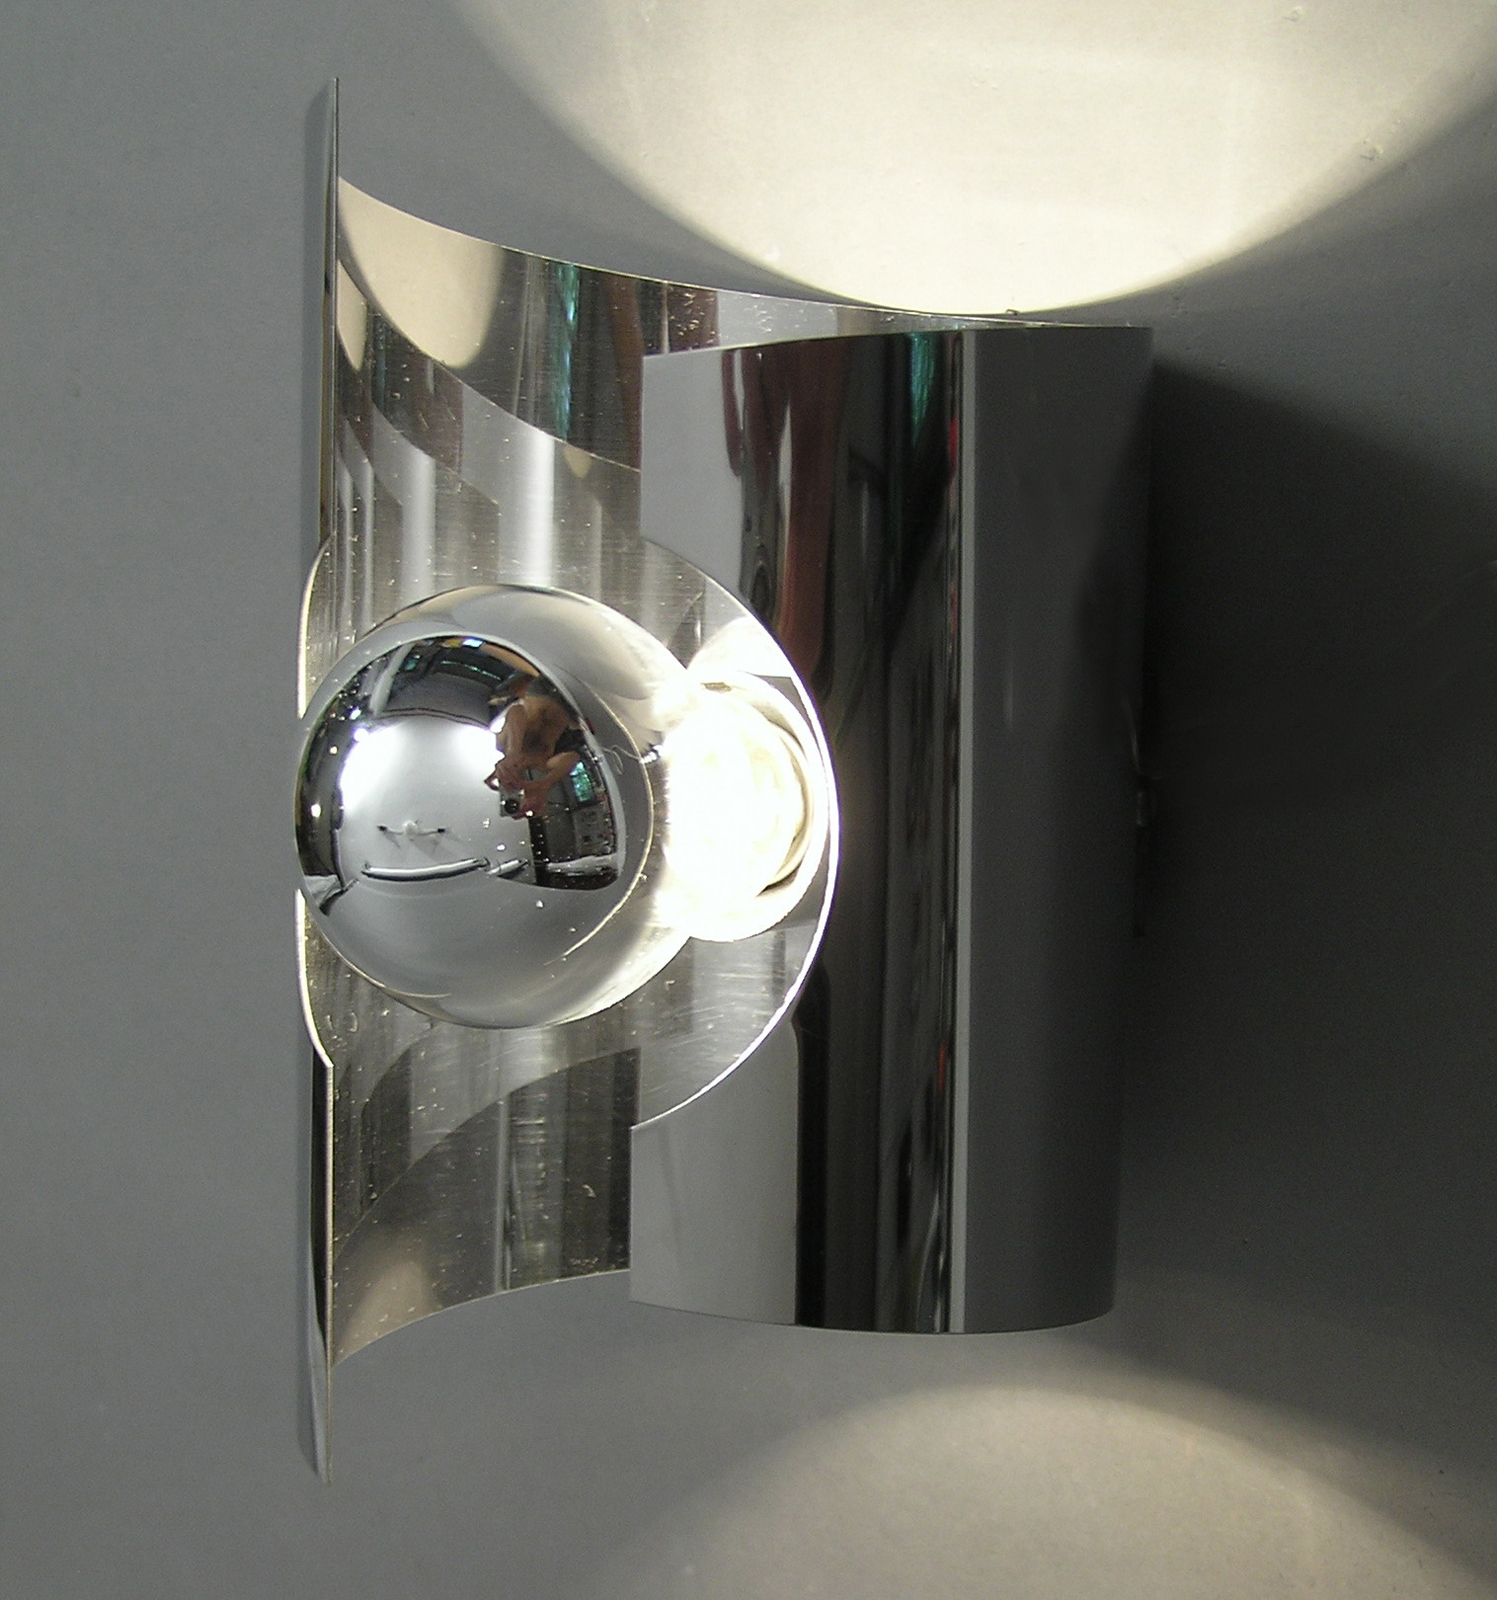 barre de spots des ann es 70 modulolab. Black Bedroom Furniture Sets. Home Design Ideas